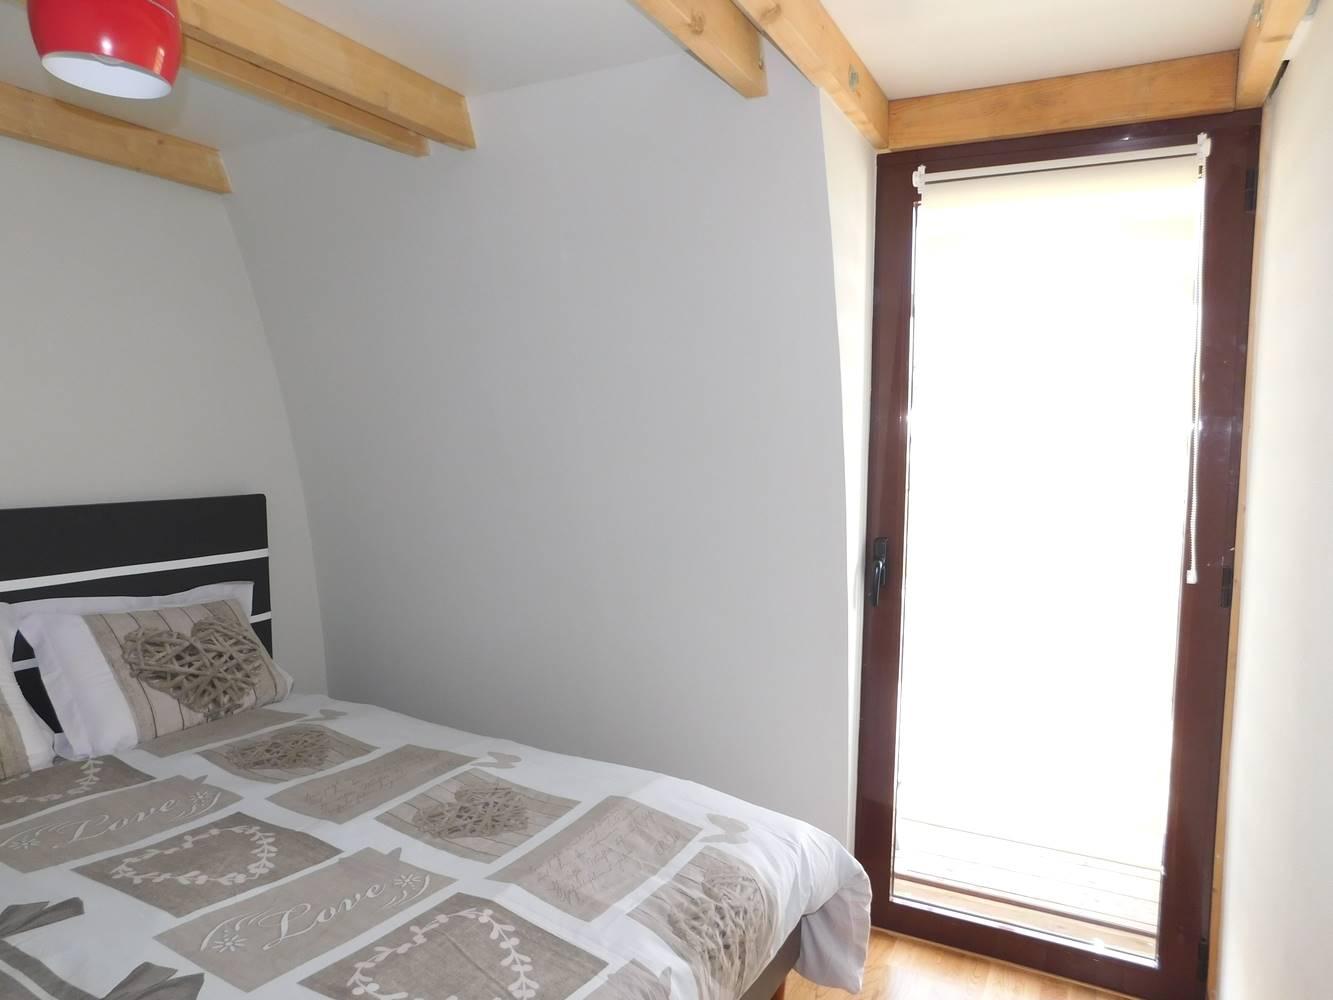 TY FOUKENN - Chambre literie neuve excellence francaise- location-morbihan-sud.com 0602362422 ©